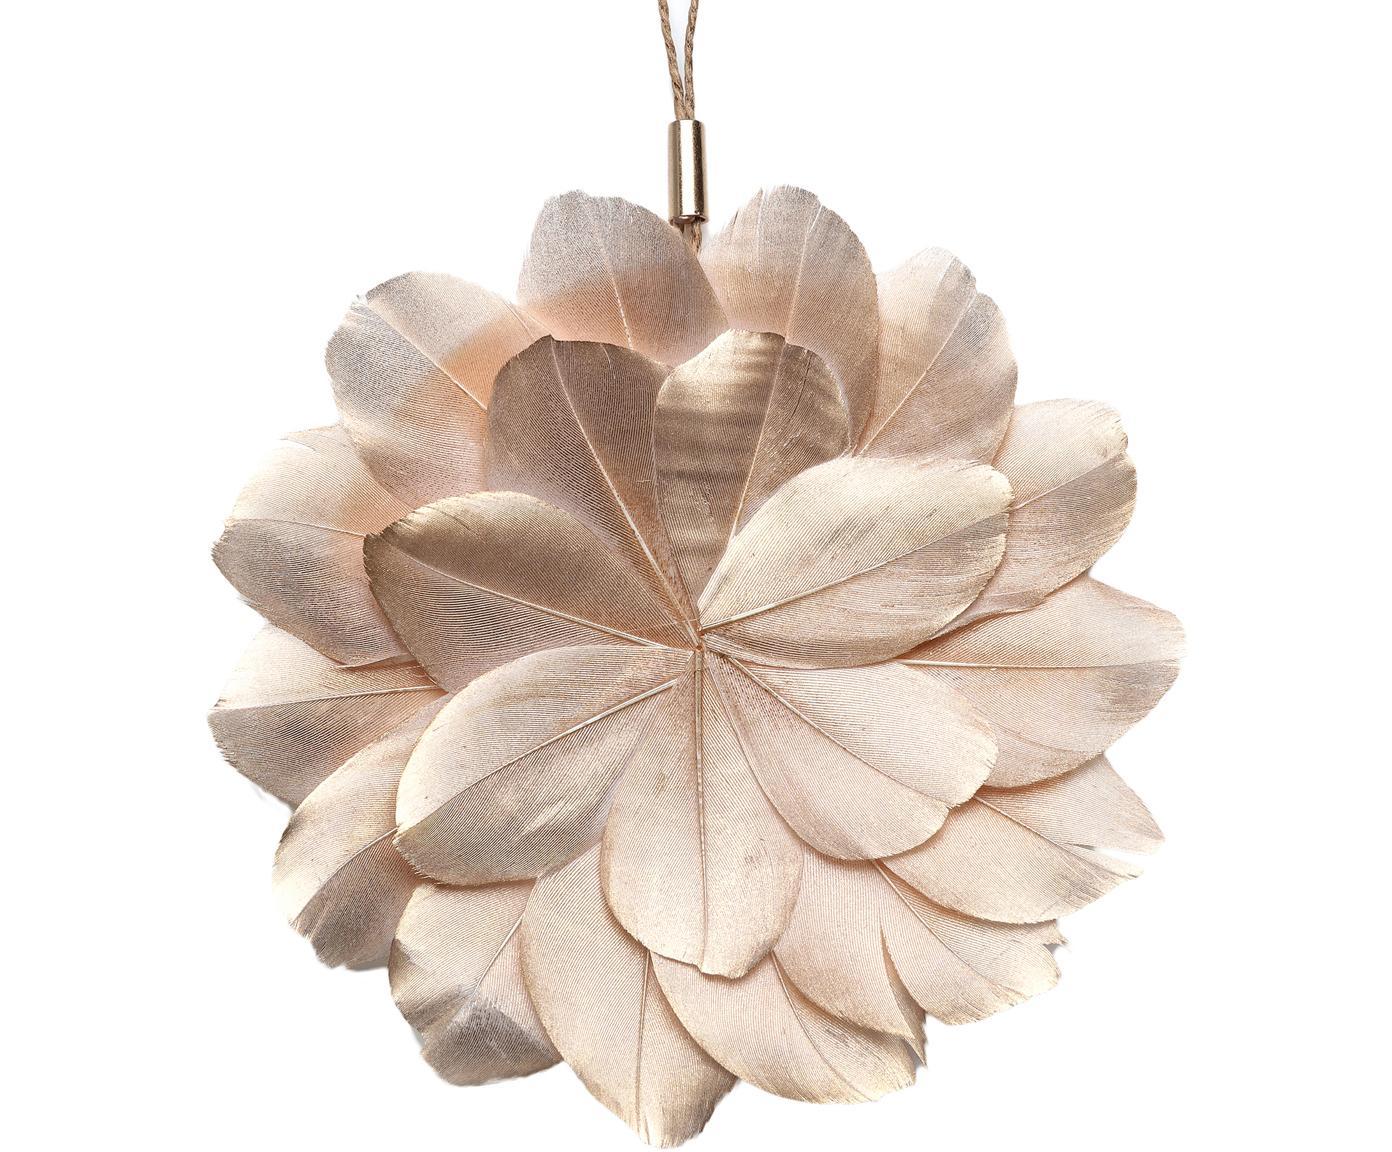 Adornos navideños Juju, 2uds., Flor: plumas teñidas, Ojal: metal, Dorado, marrón, Ø 12 x Fondo 1 cm